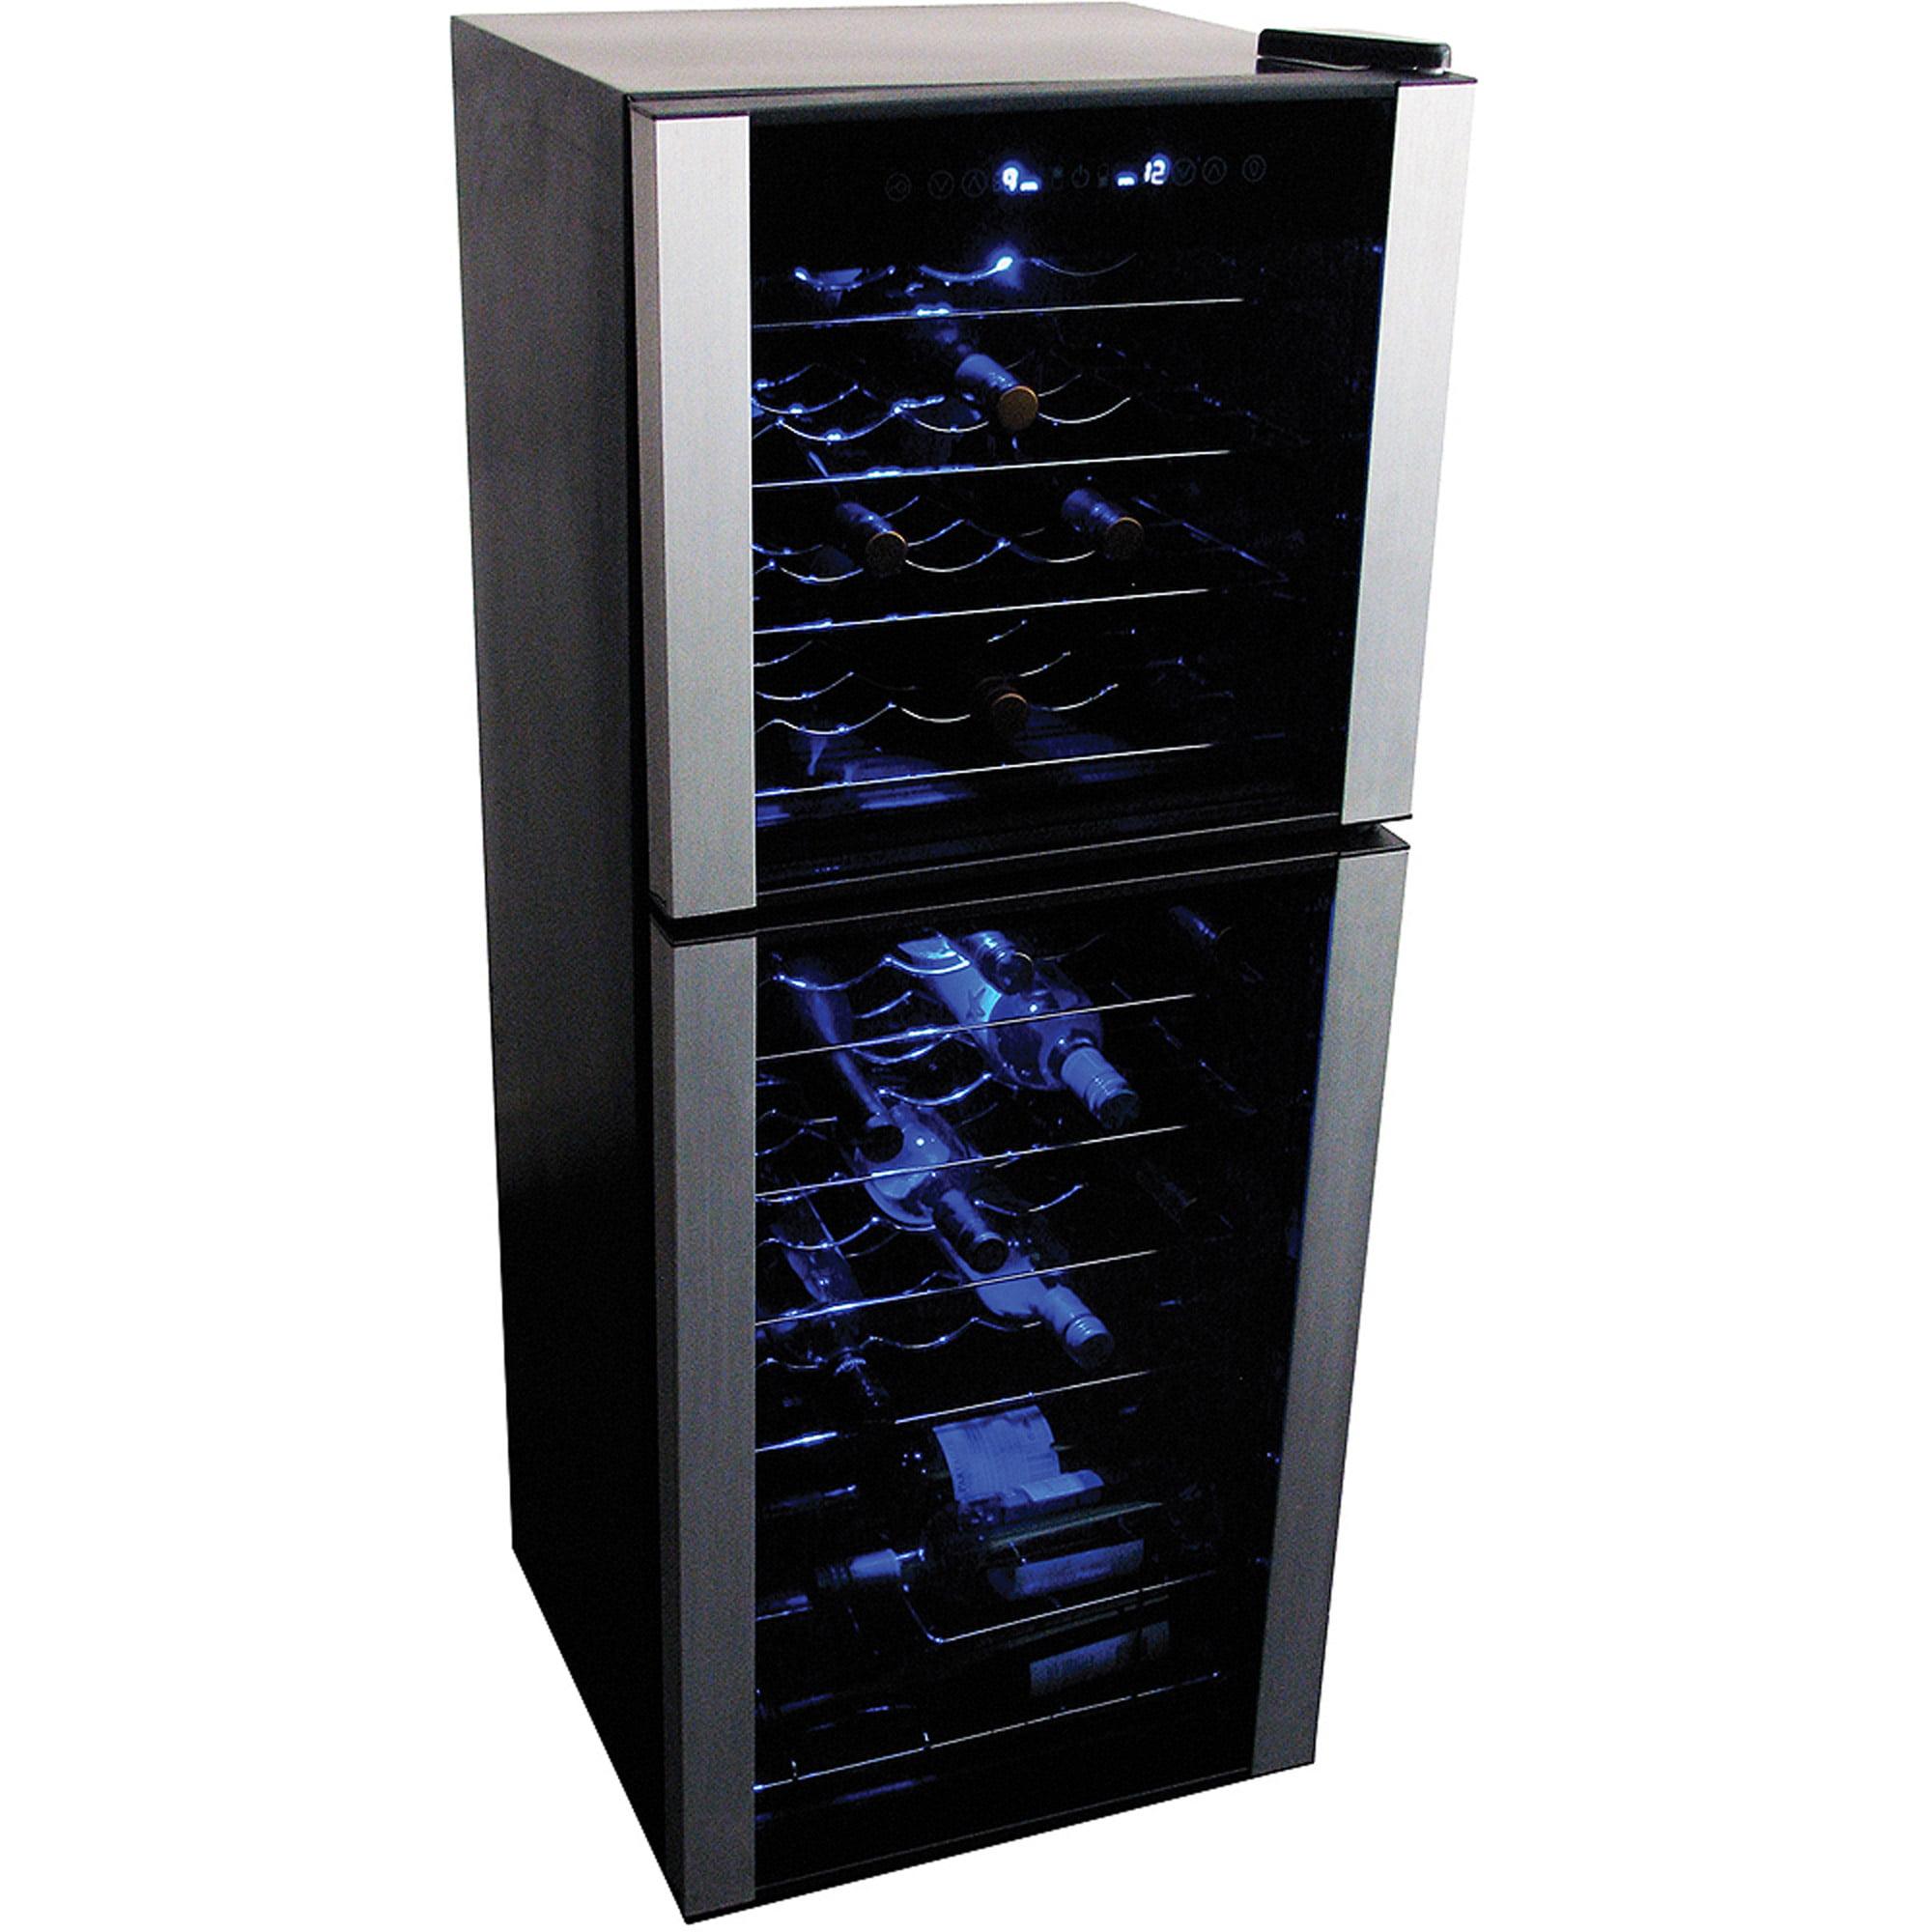 Koolatron 45 Bottle Dual Zone Compressor Wine Cooler, Stainless Steel trim